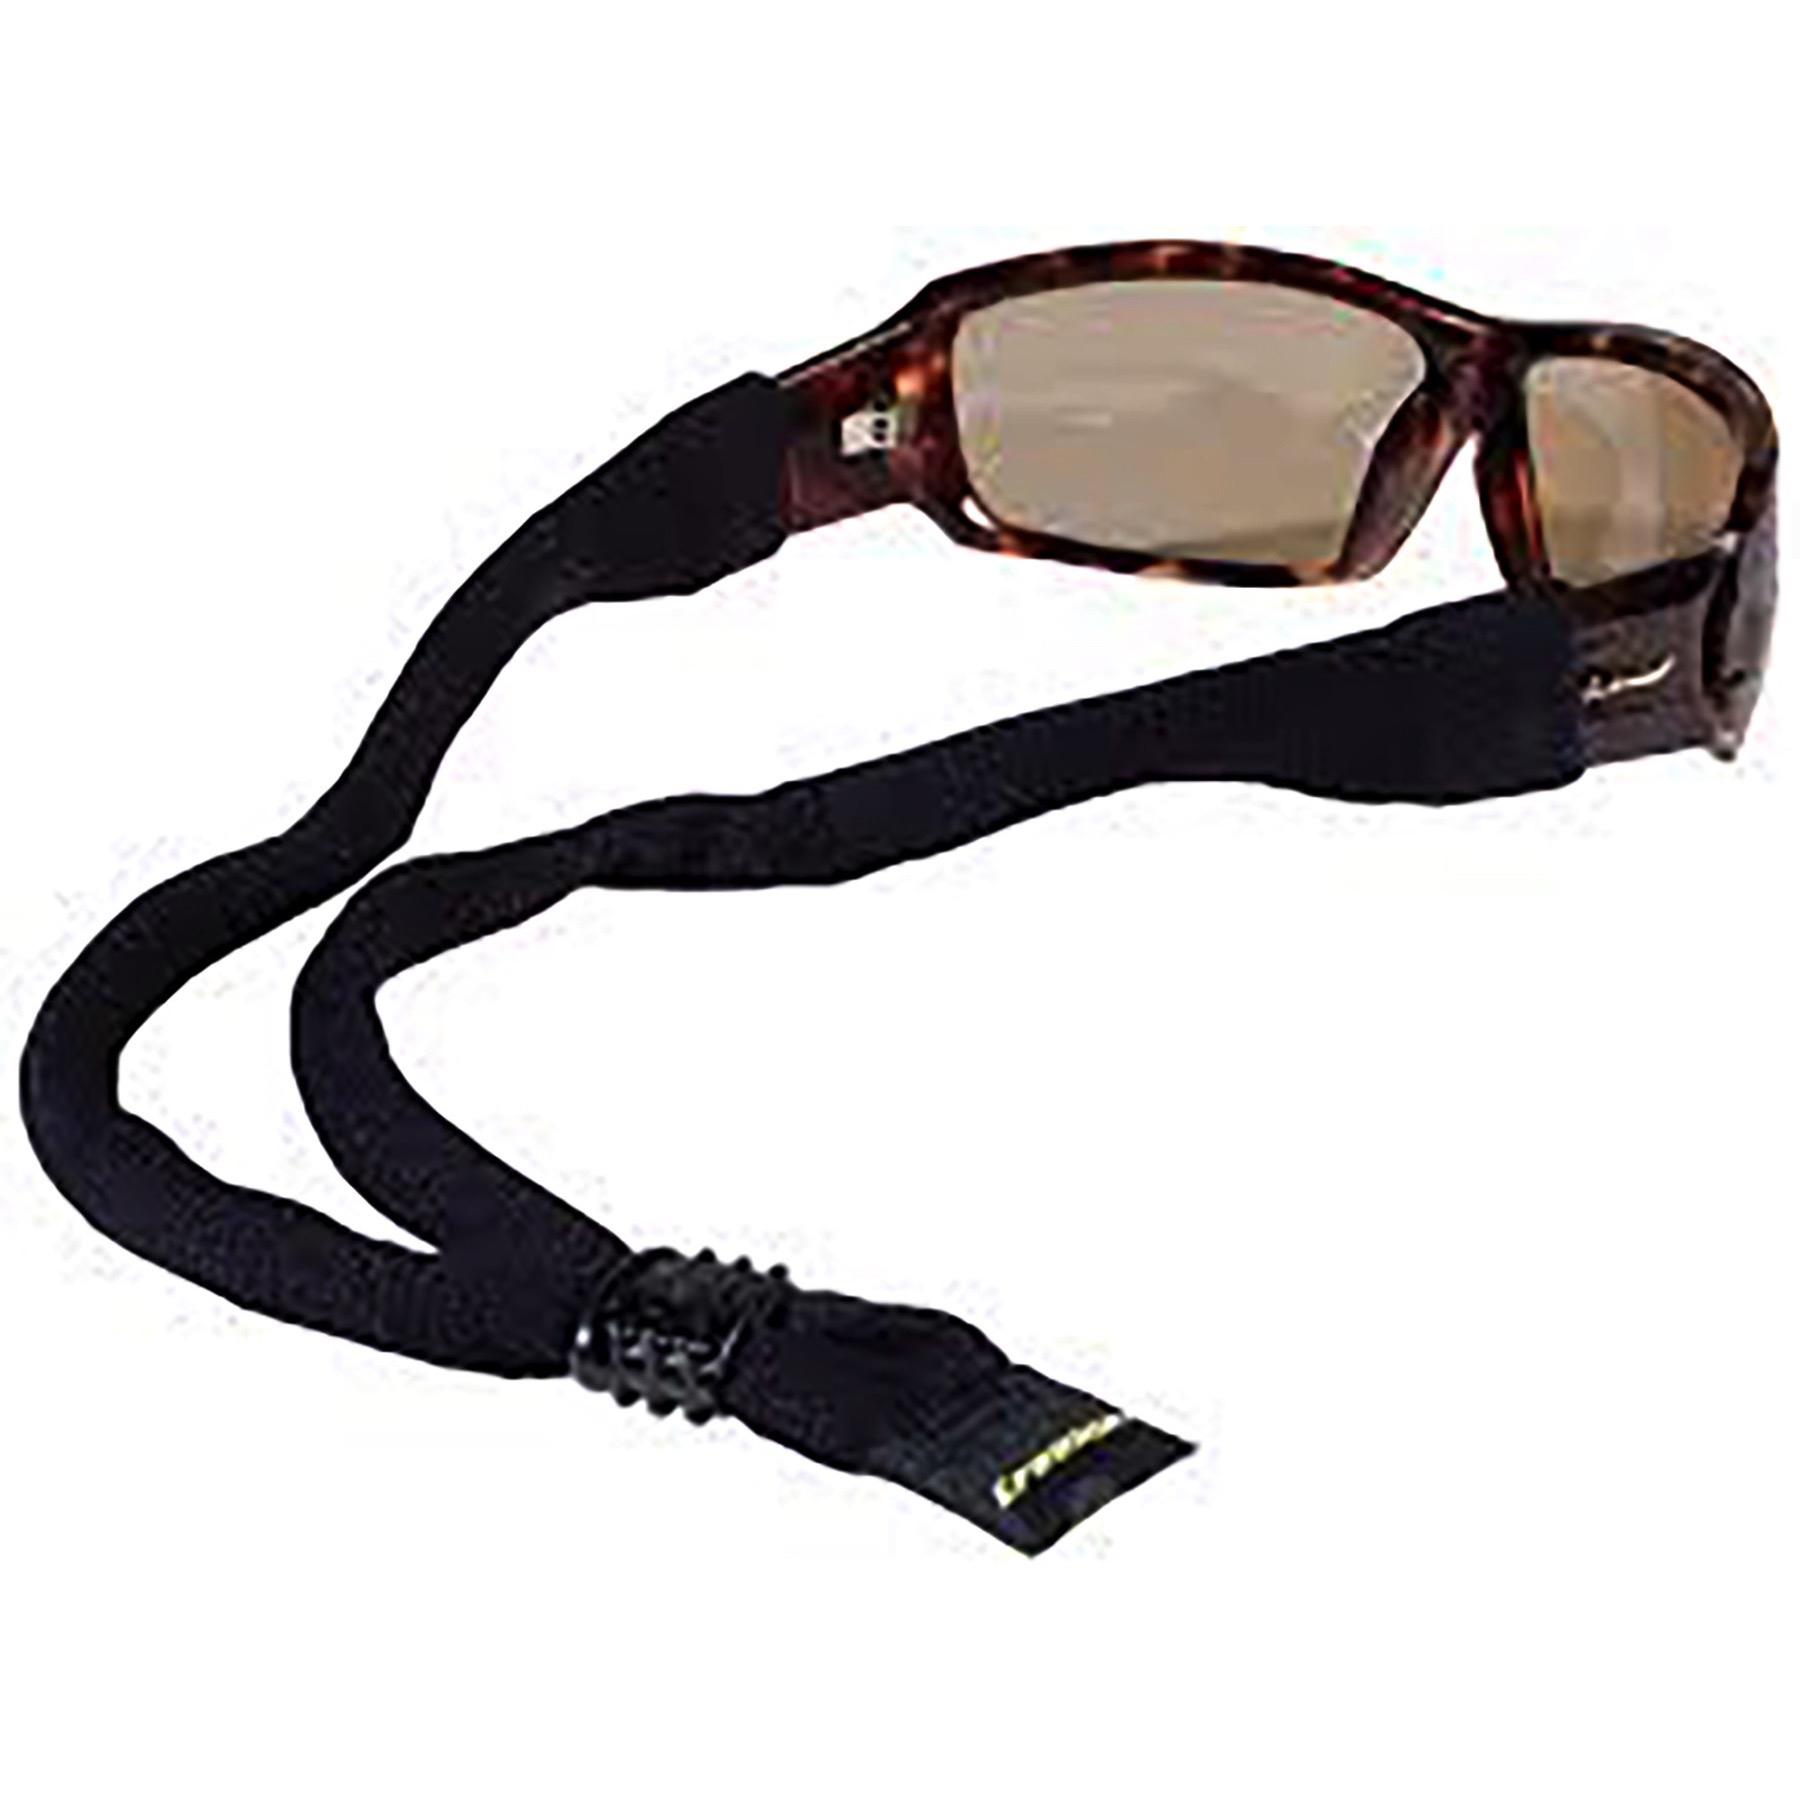 Croakies Original Eyewear Retainer Black Sunglasses Strap Adjustable 6-Pack